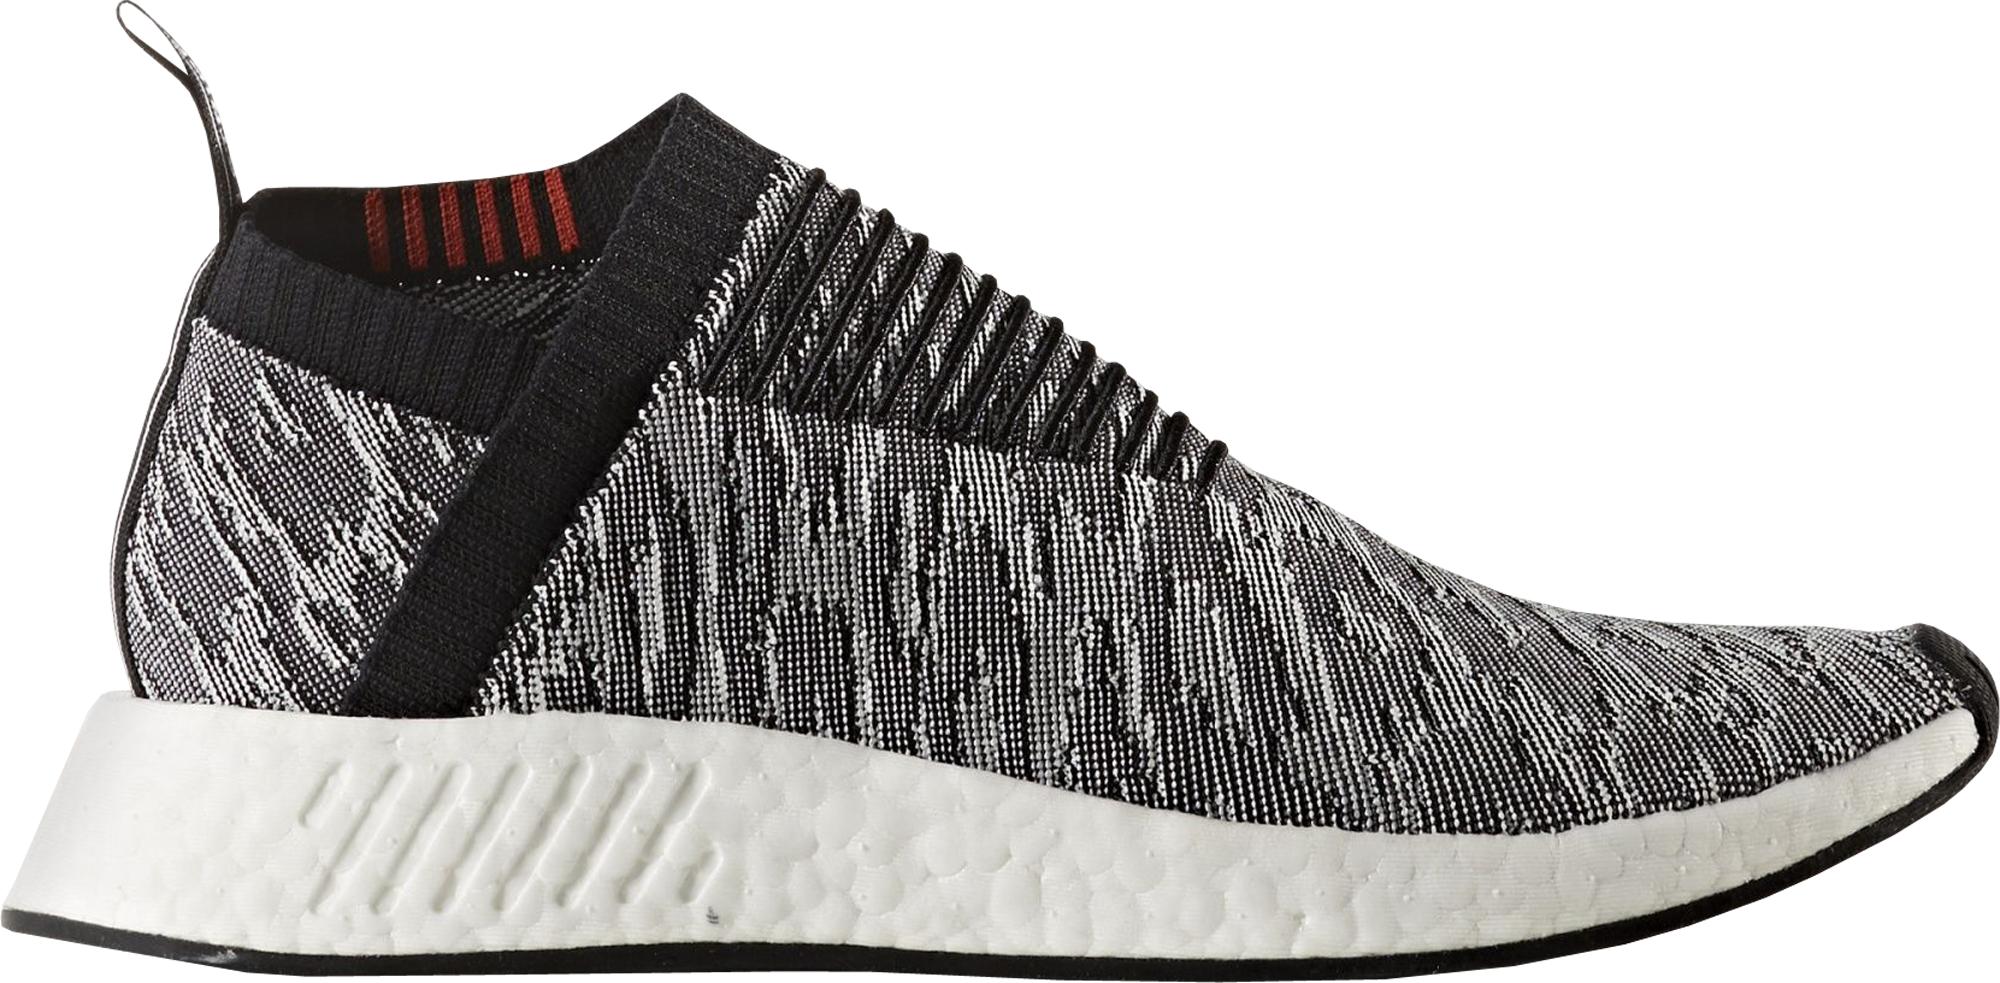 adidas NMD CS2 Glitch Black Red White